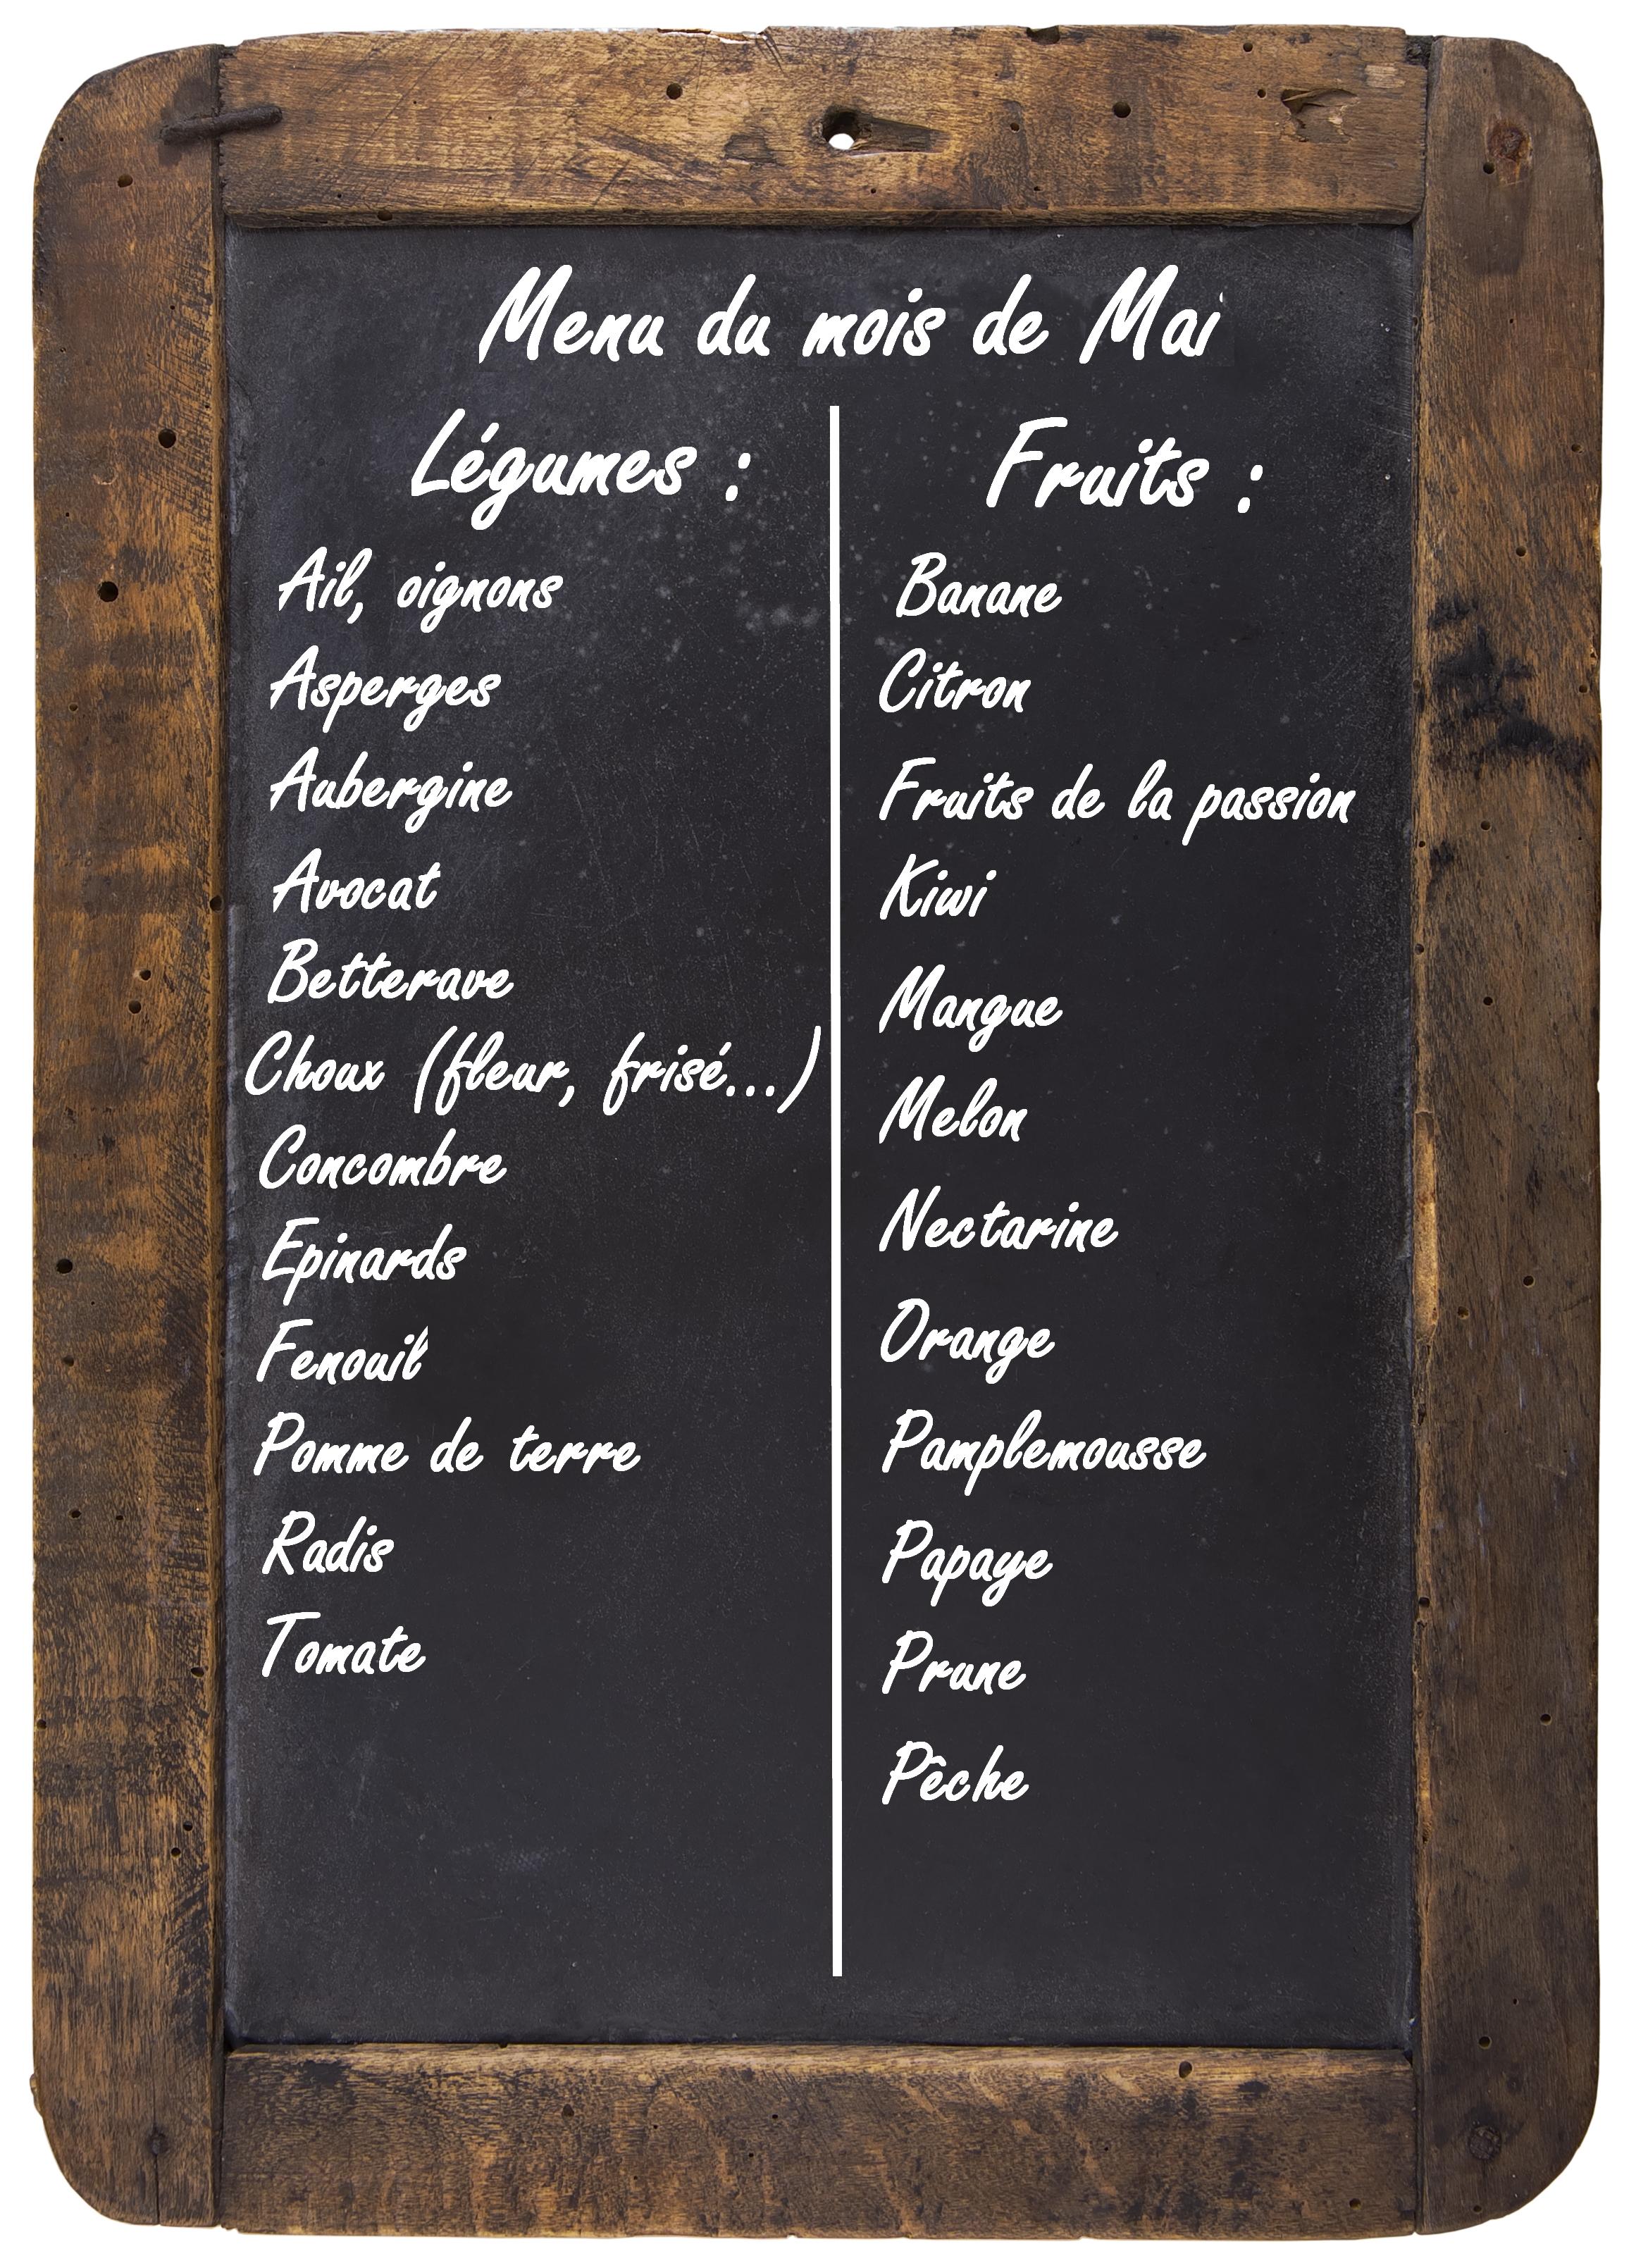 fruits_legumes_saison_mai